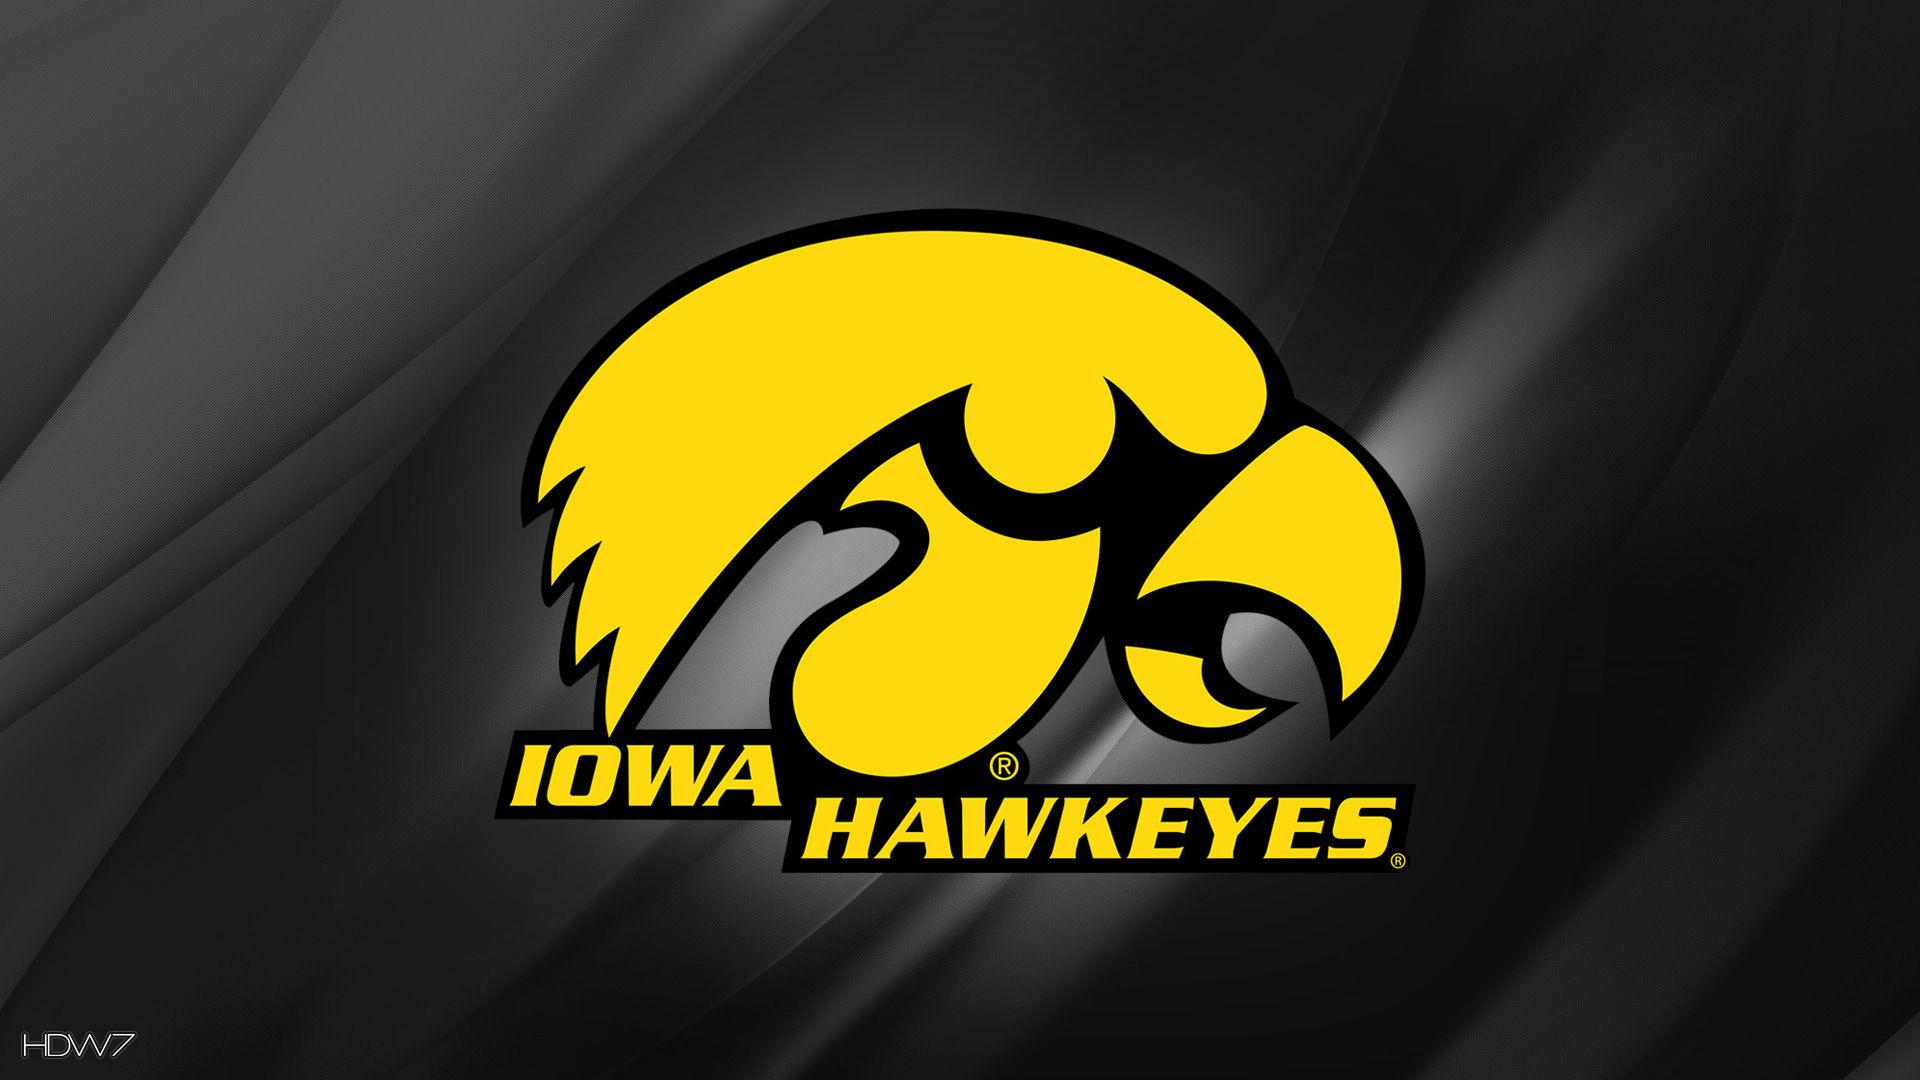 Iowa Hawkeye Screensavers And Wallpaper 39 Images